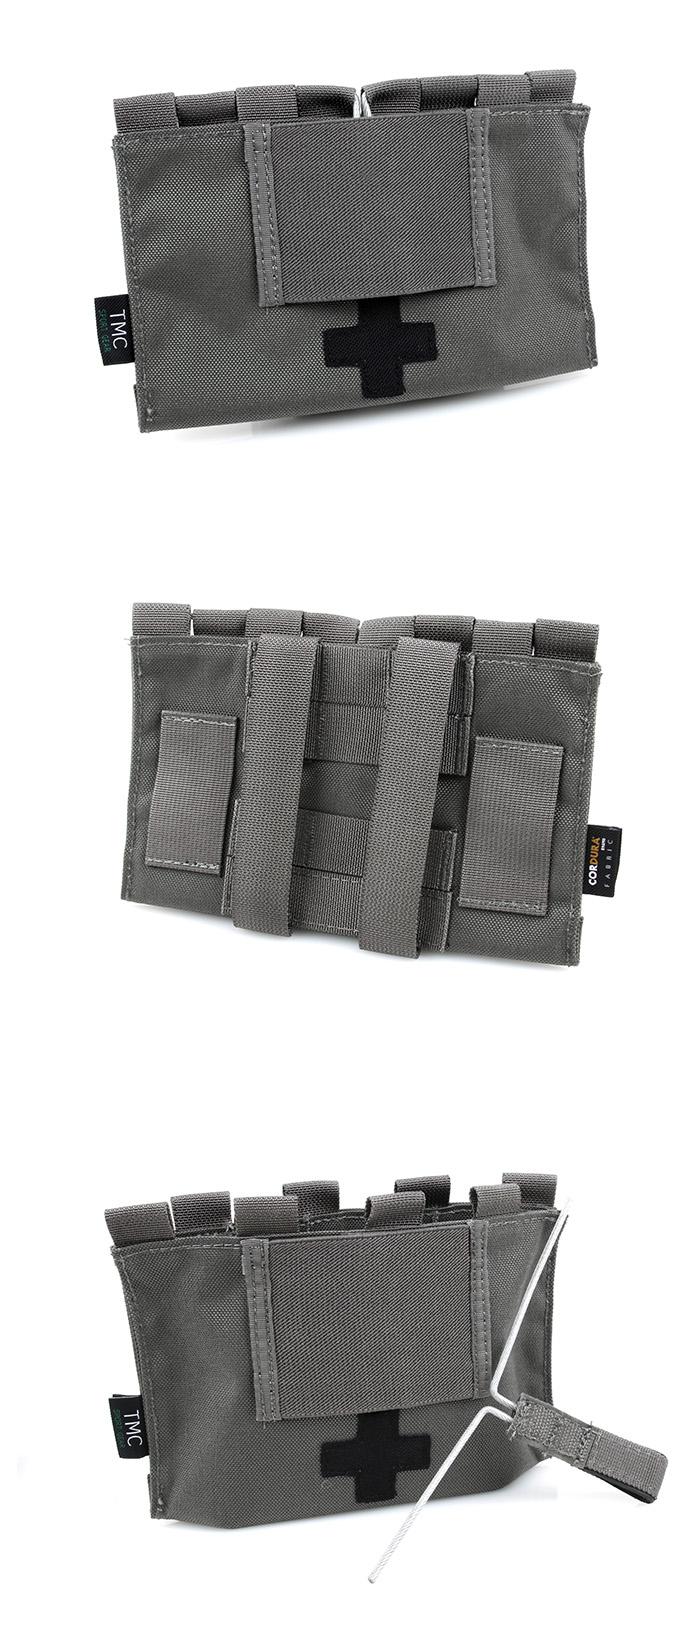 Tmc Universal Quick Release Medical Pouch Ranger Green